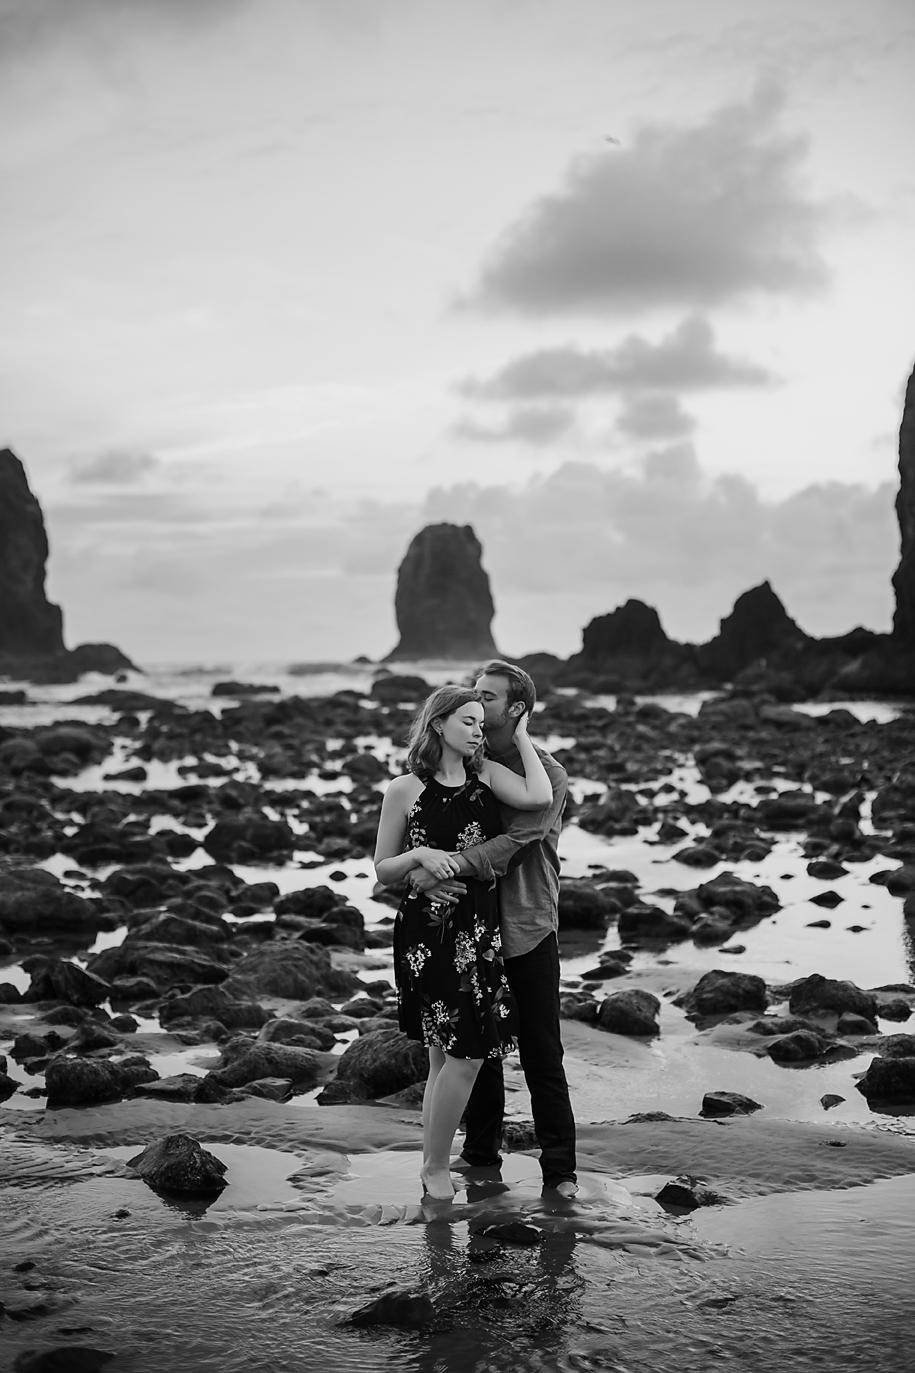 Amanda + Matt - Oregon Coast Engagement Photographer - Destination Elopement Photographer - Emily & Co. Photography (17).jpg